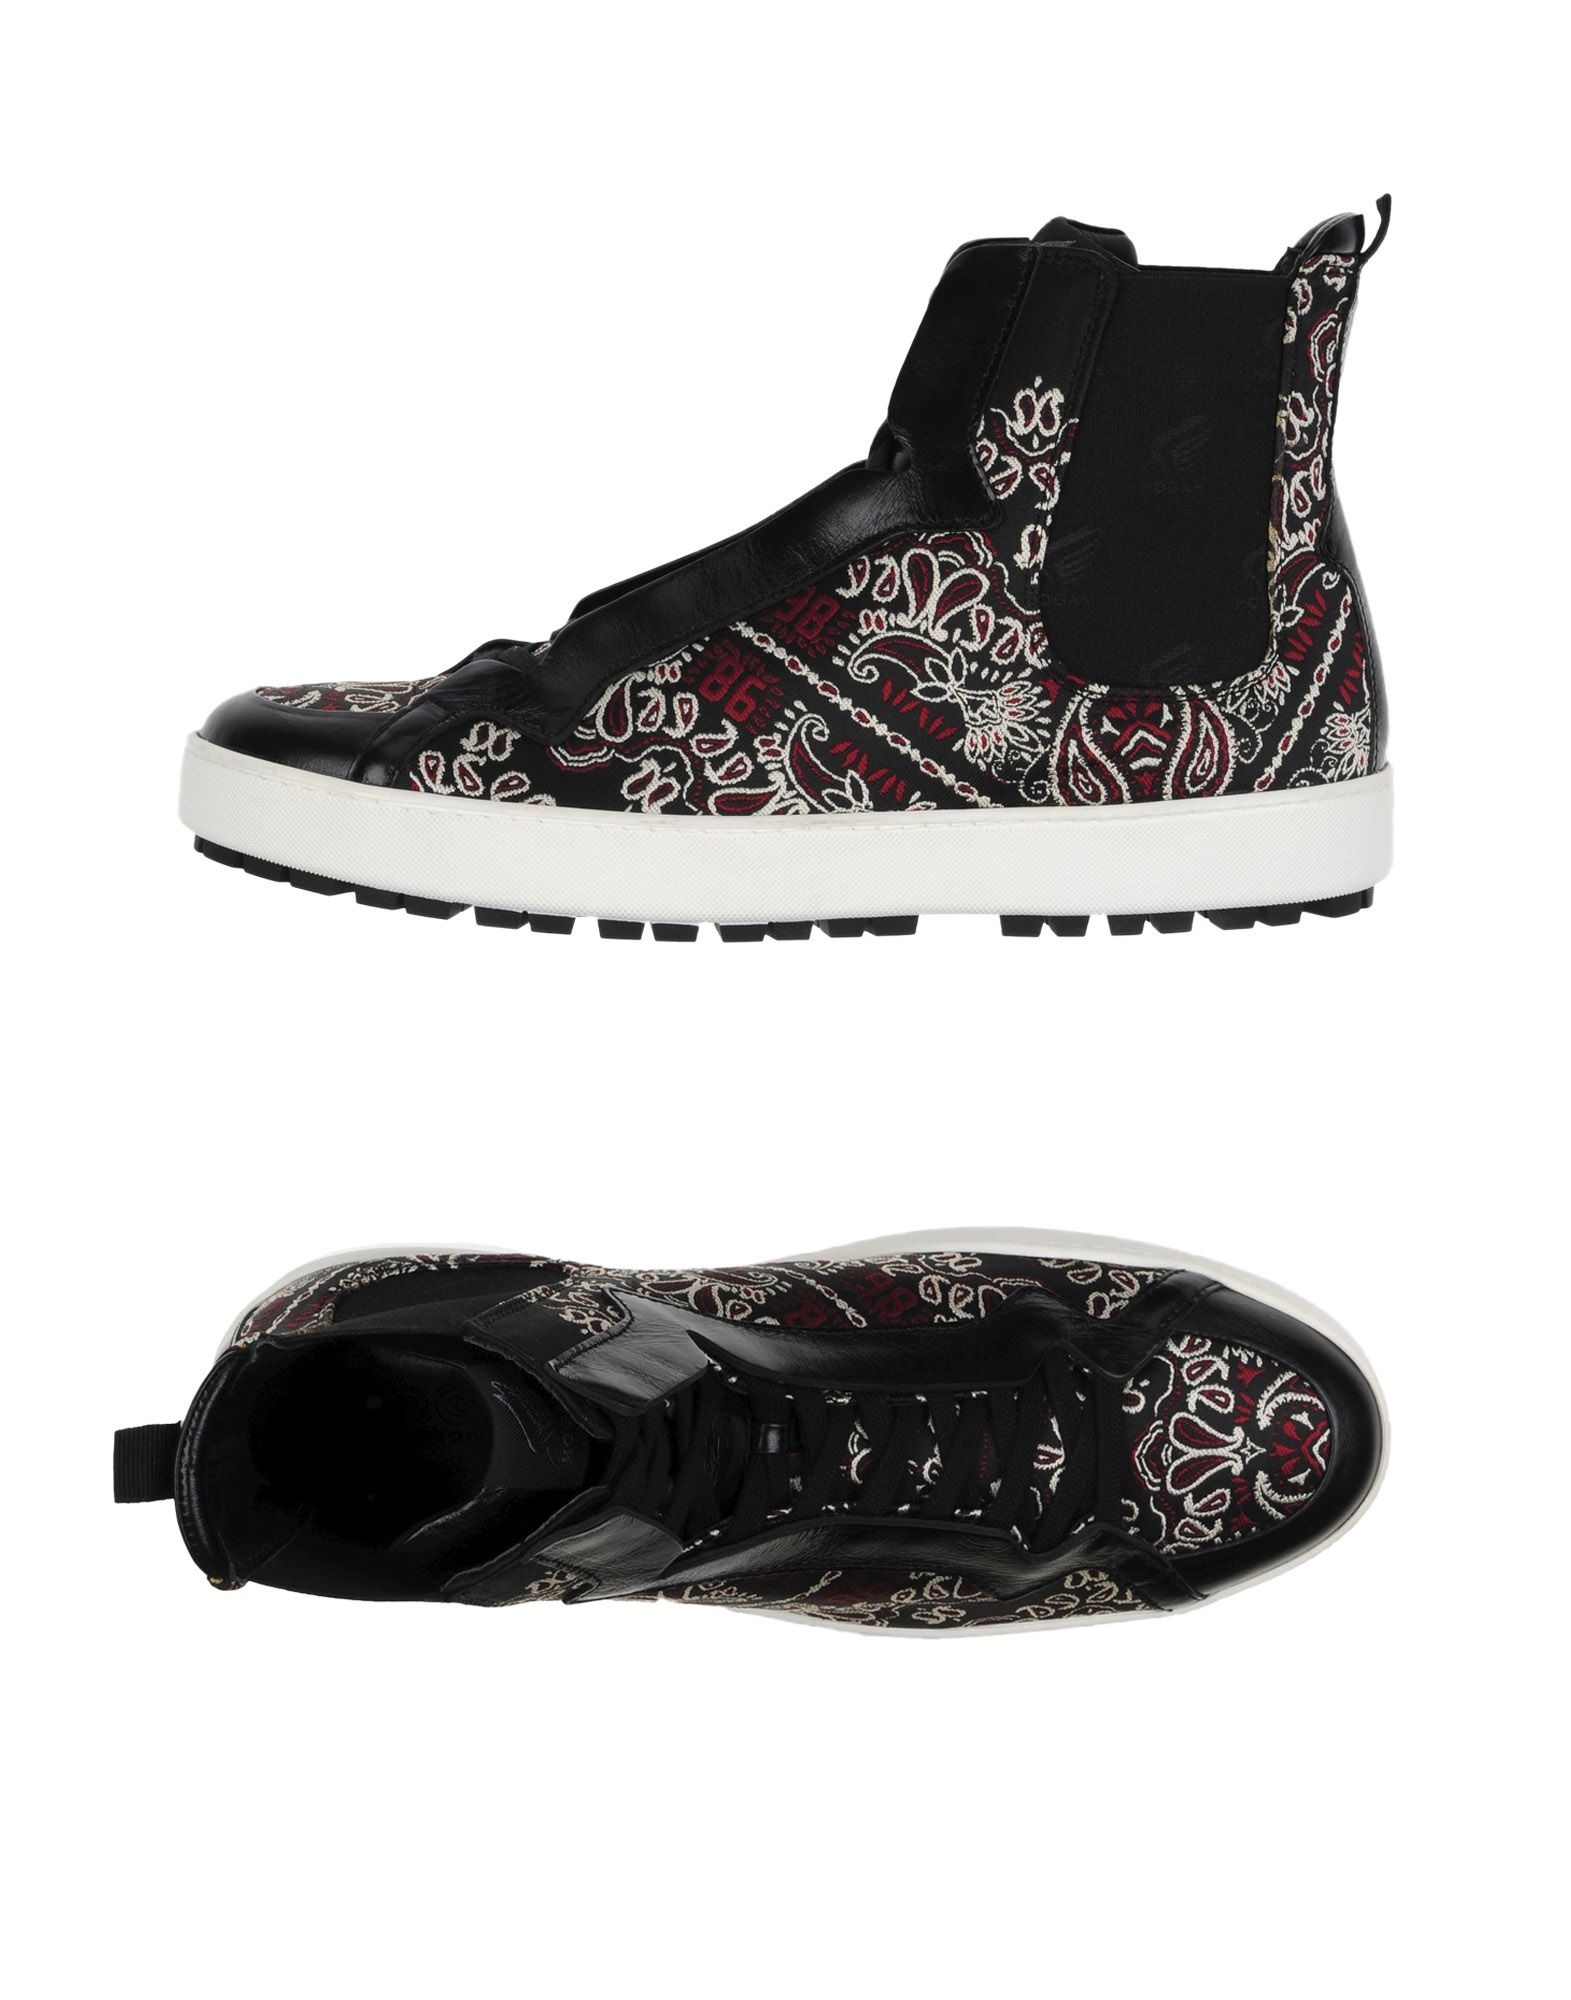 Hogan Sneakers Herren  11298016RN Gute Qualität beliebte Schuhe